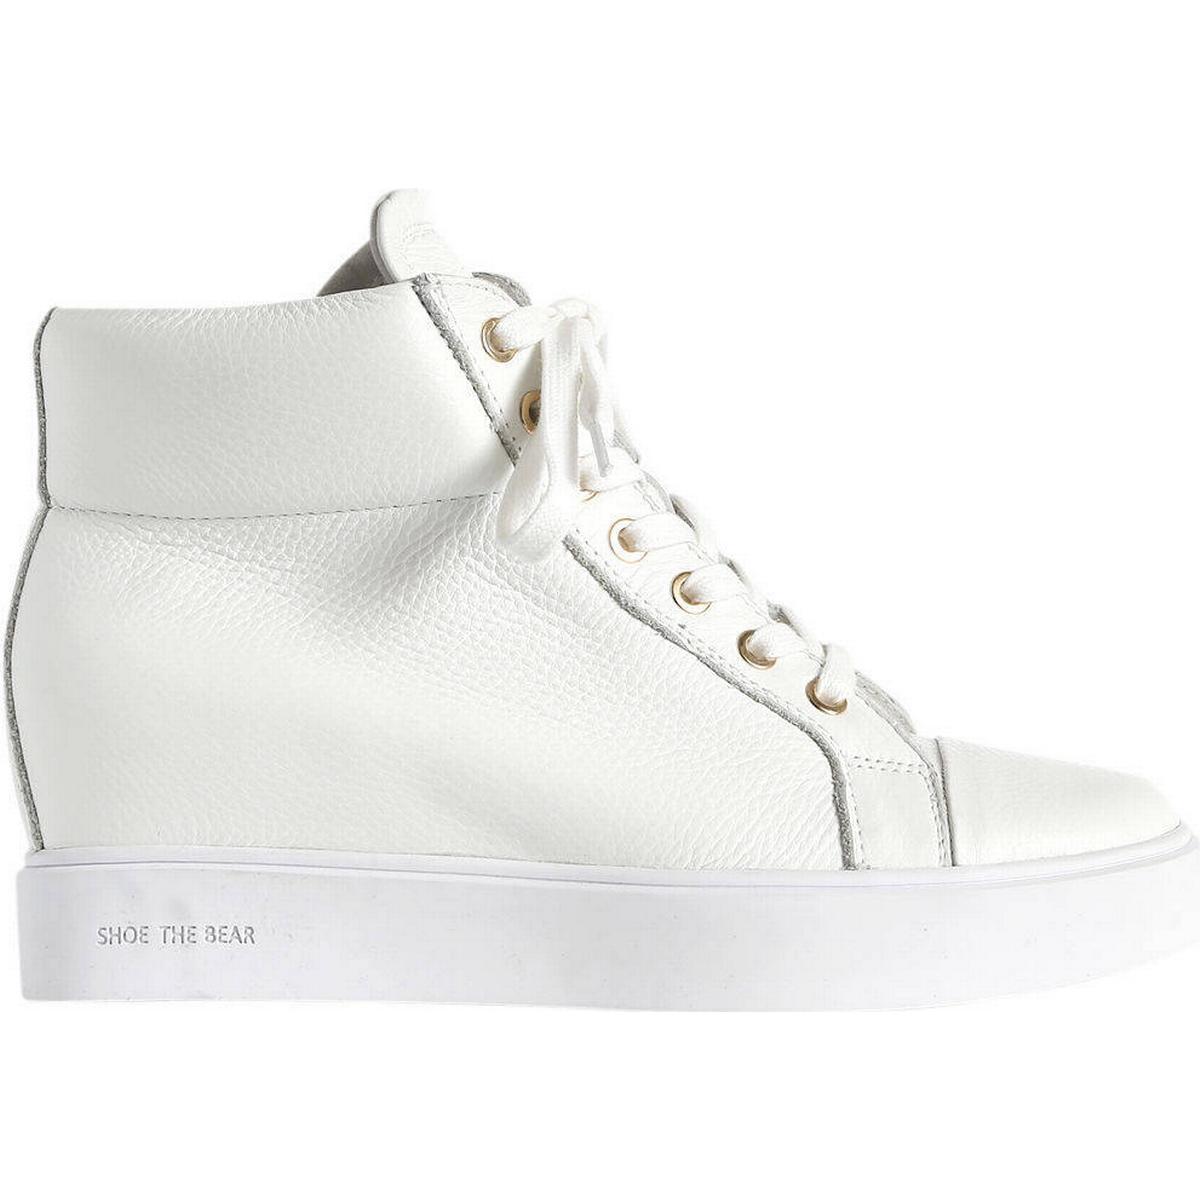 f29a7333ec0 Kilklack - Sneakers - Jämför priser på wedge PriceRunner